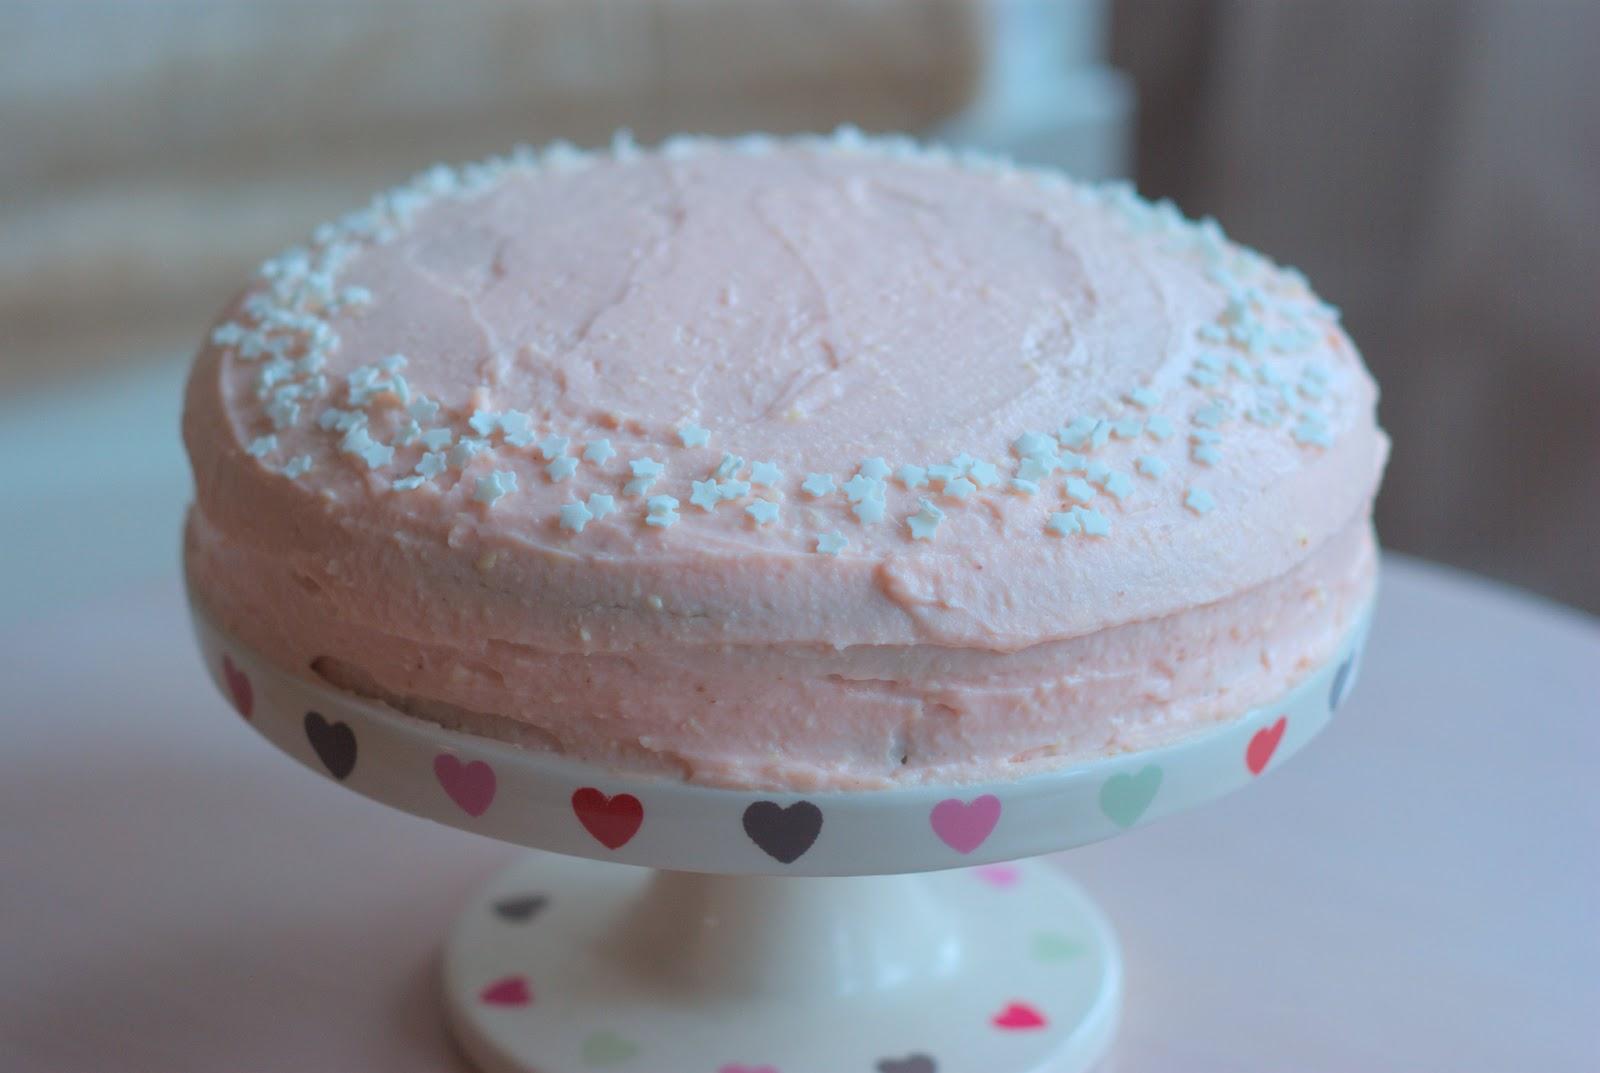 Peanutbutter Jelly Cake